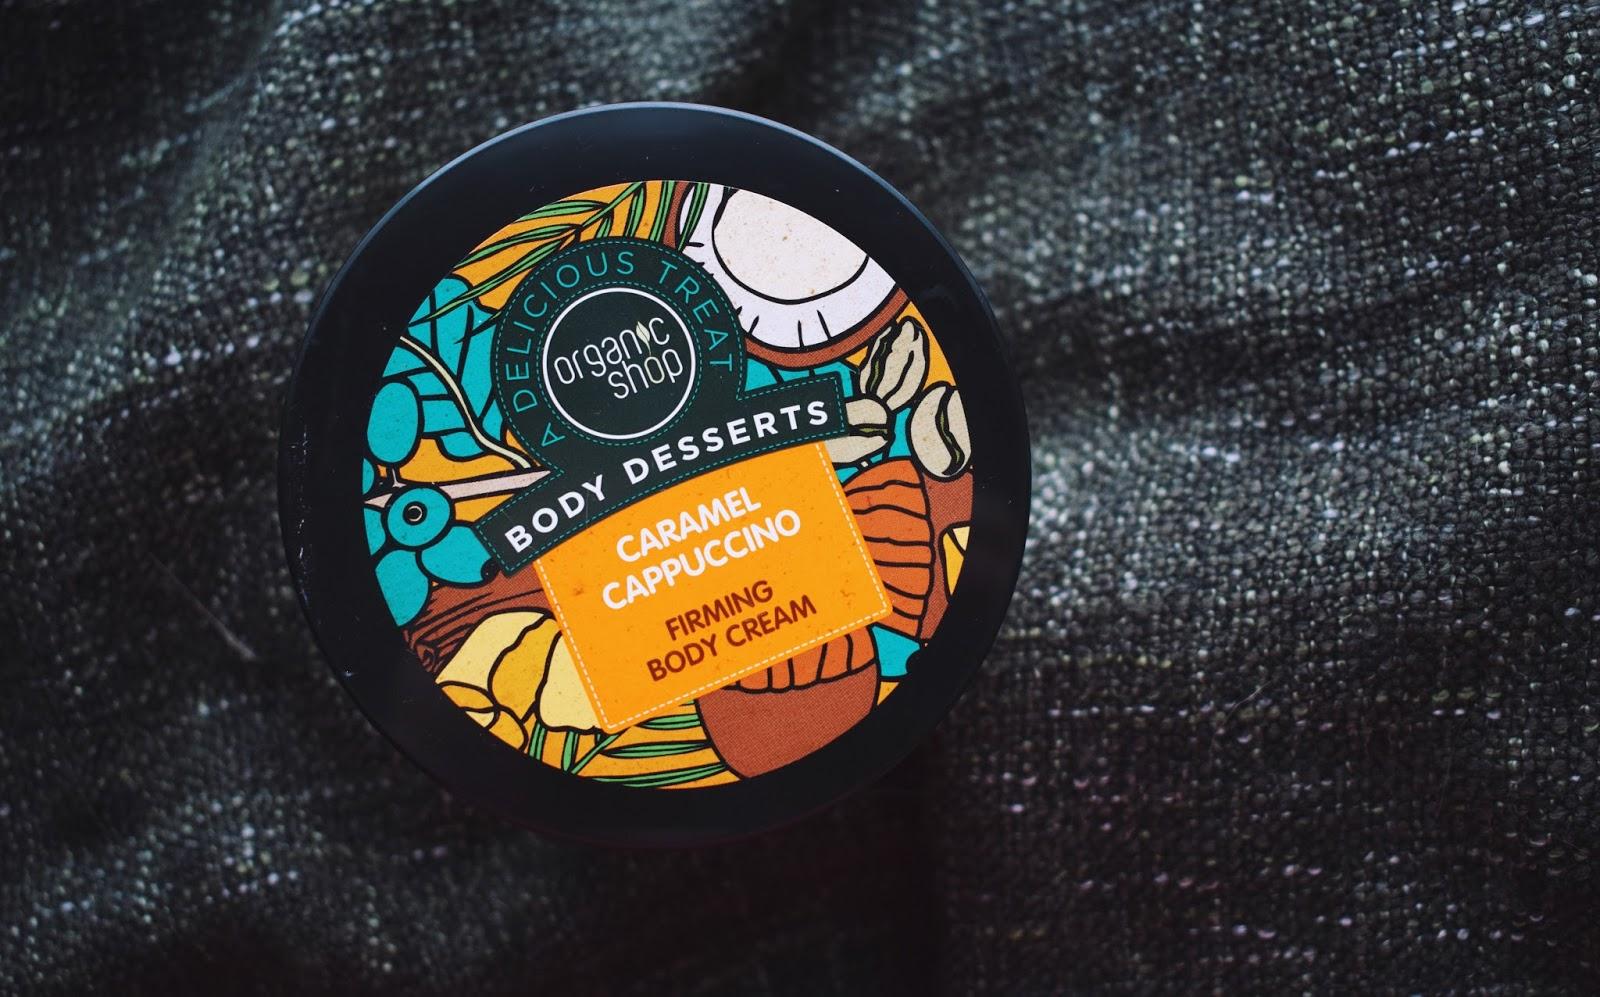 organic shop body desserts caramel cappuccino firming body cream vartalovoide vartalo voide kiinteyttävä